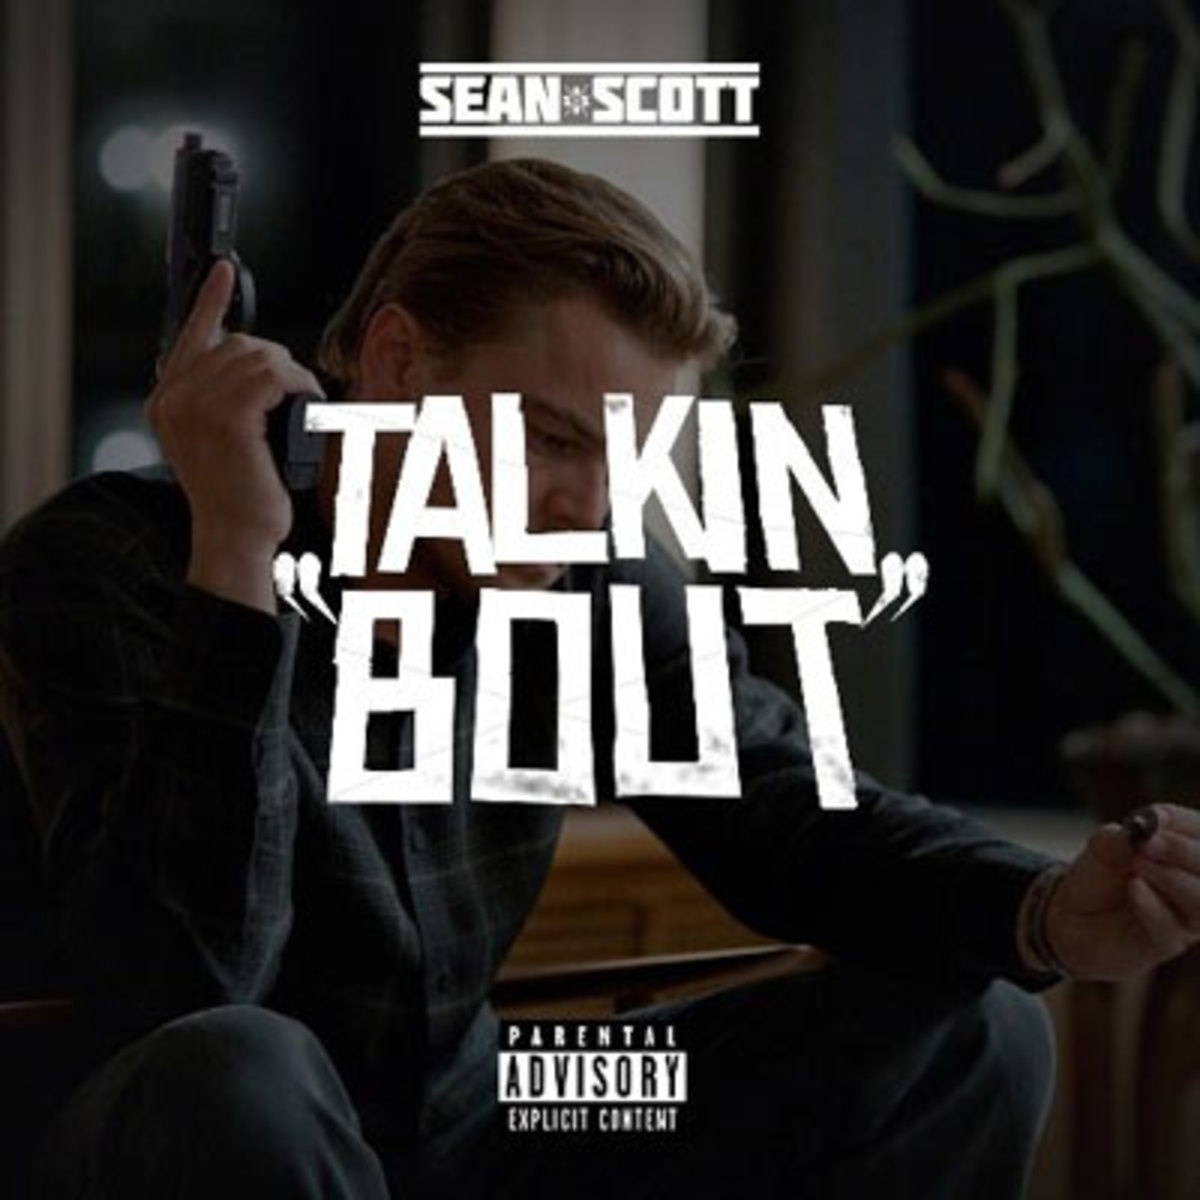 seanscott-talkinbout.jpg